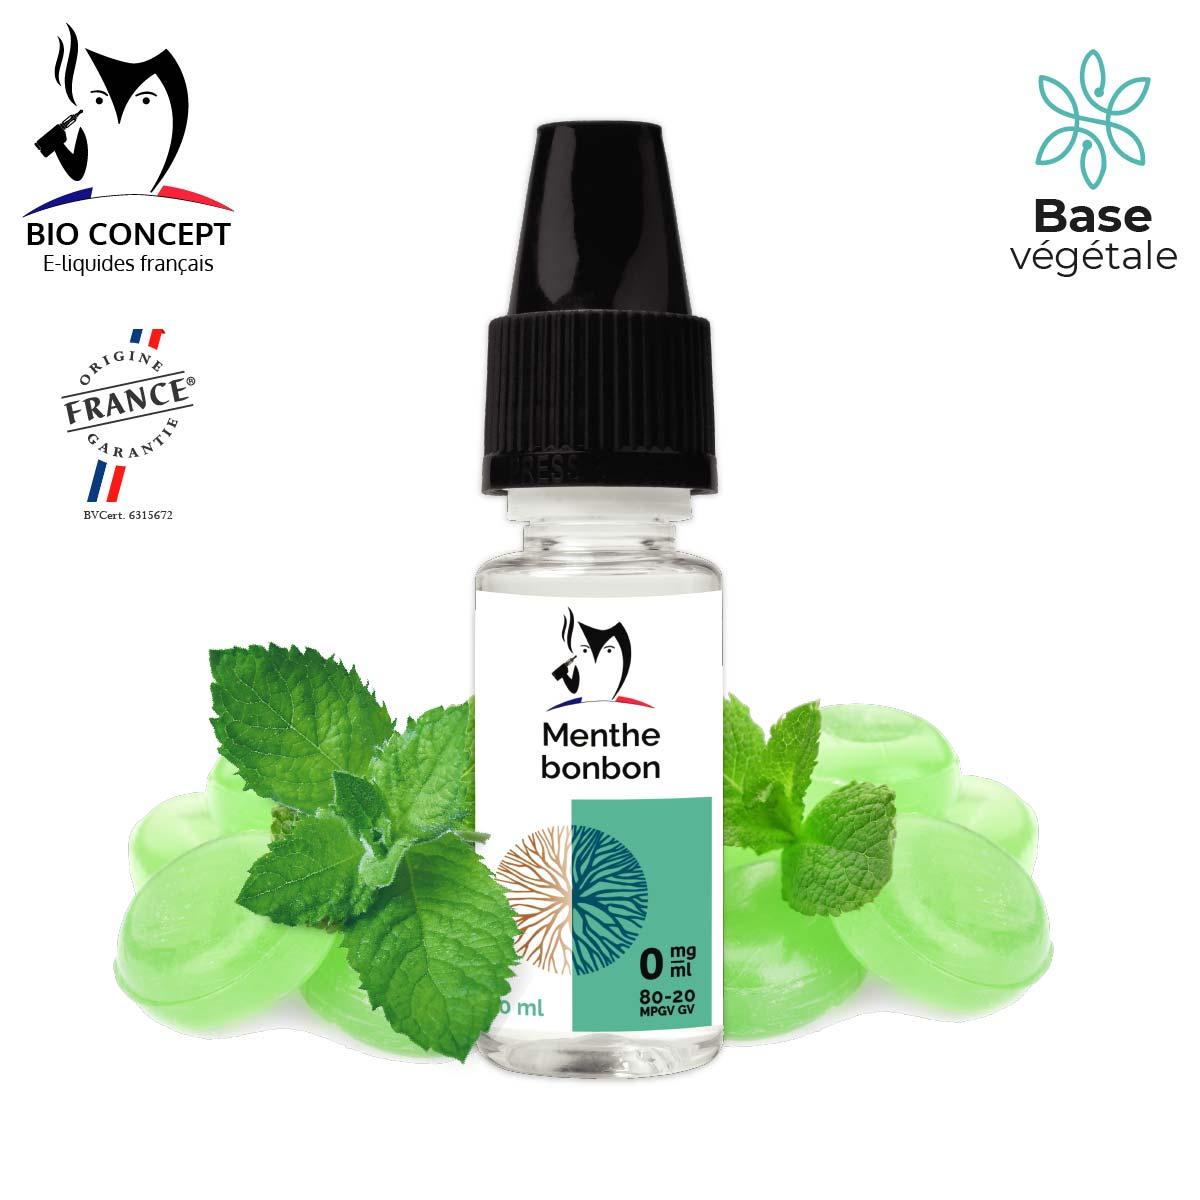 menthe-bonbon-visuel-fiche-pharma-e-liquide.jpg